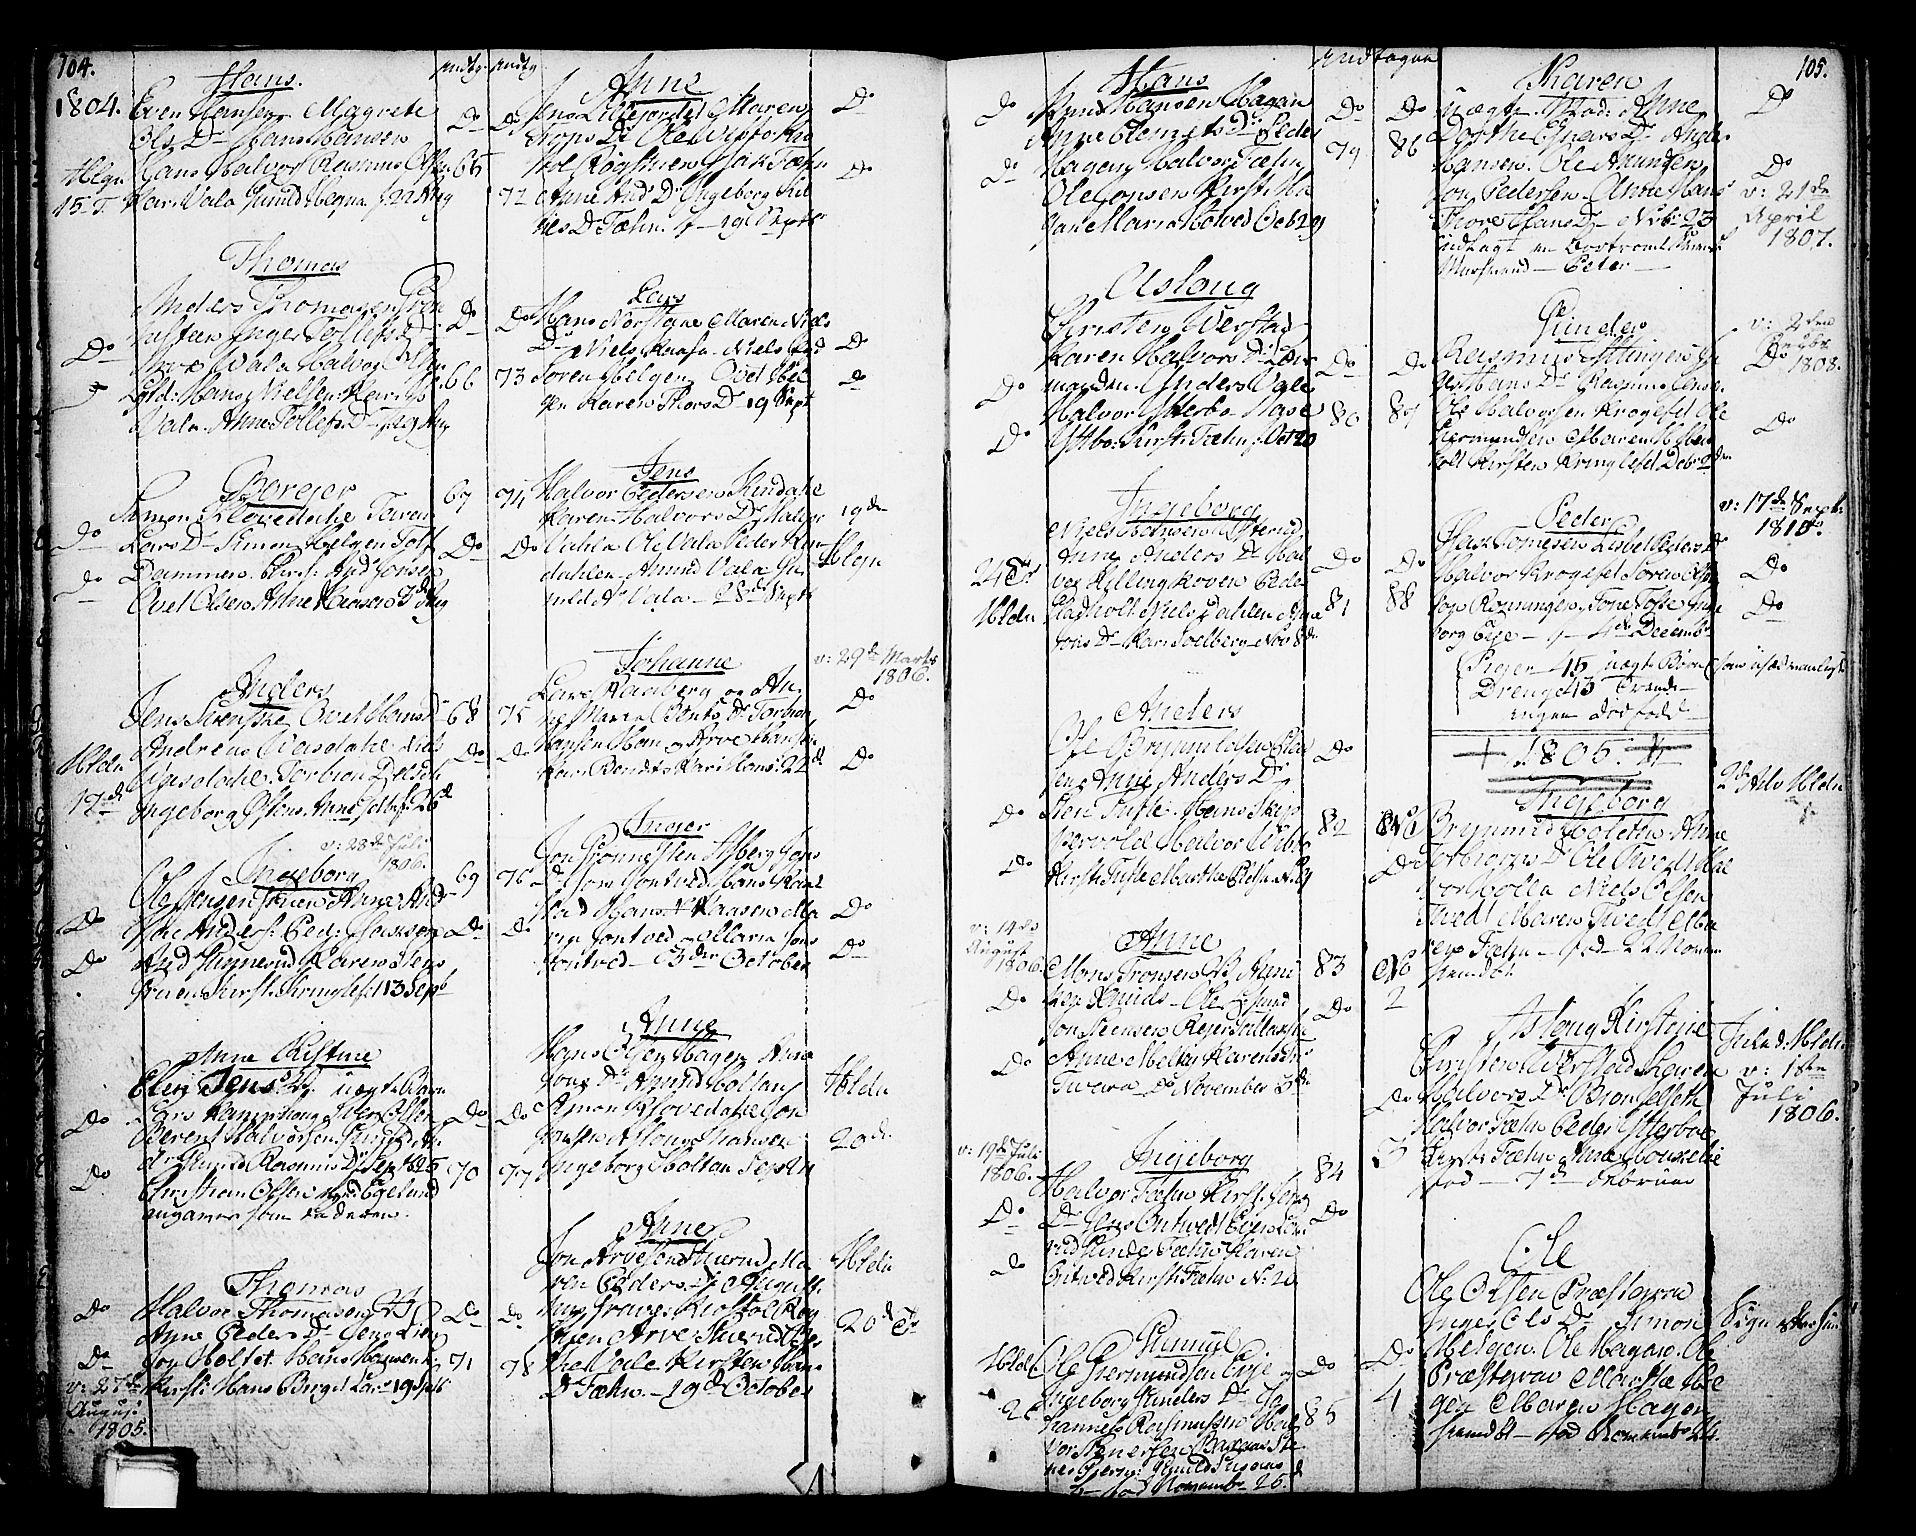 SAKO, Holla kirkebøker, F/Fa/L0002: Ministerialbok nr. 2, 1779-1814, s. 104-105